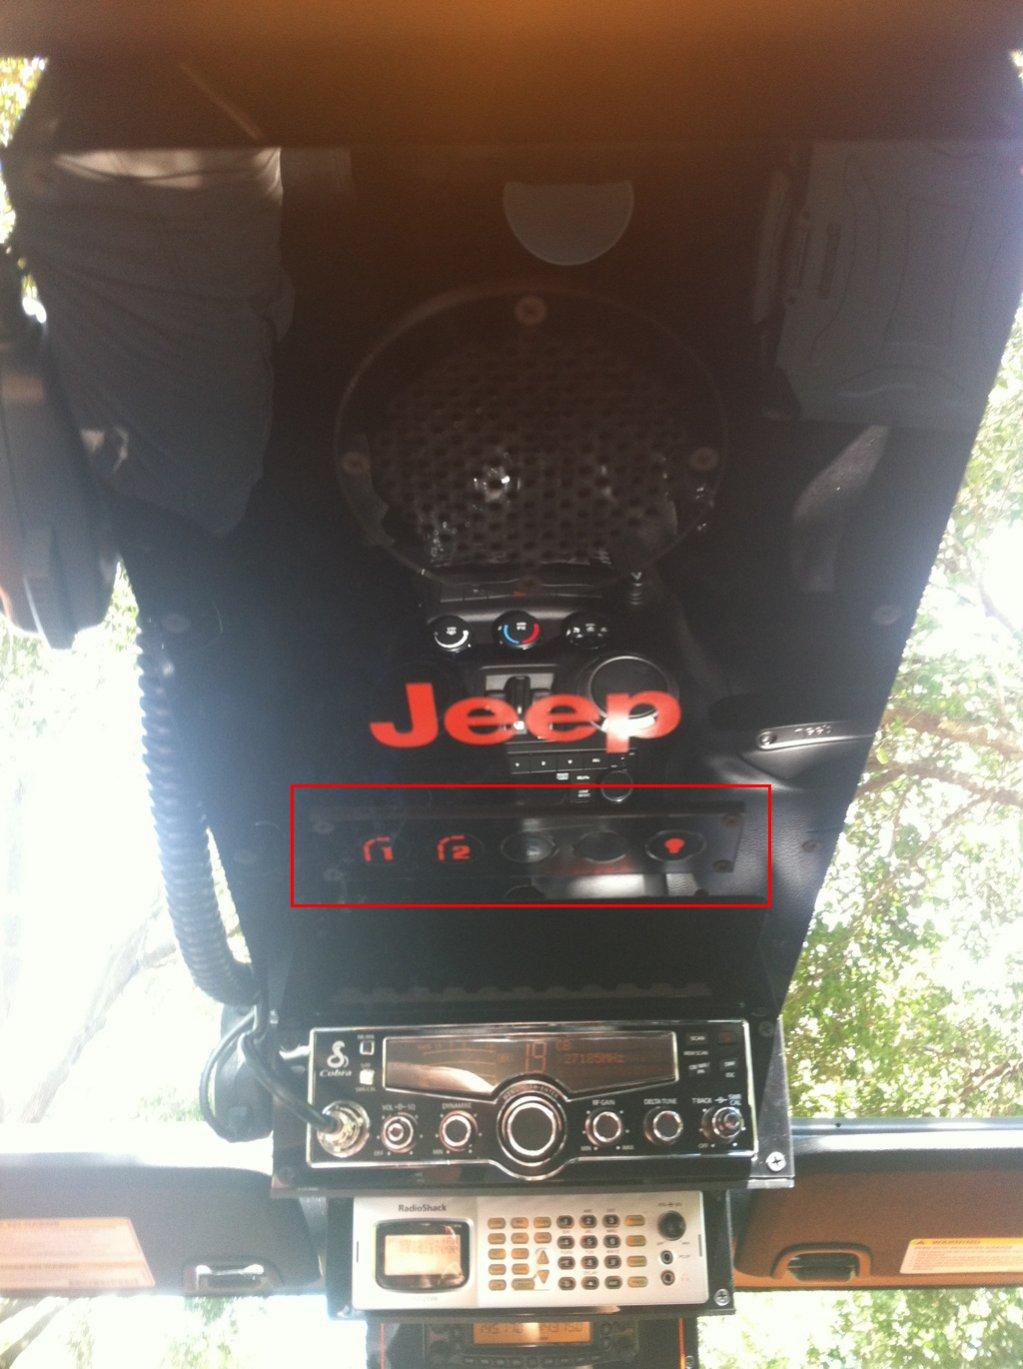 jeep20.jpg